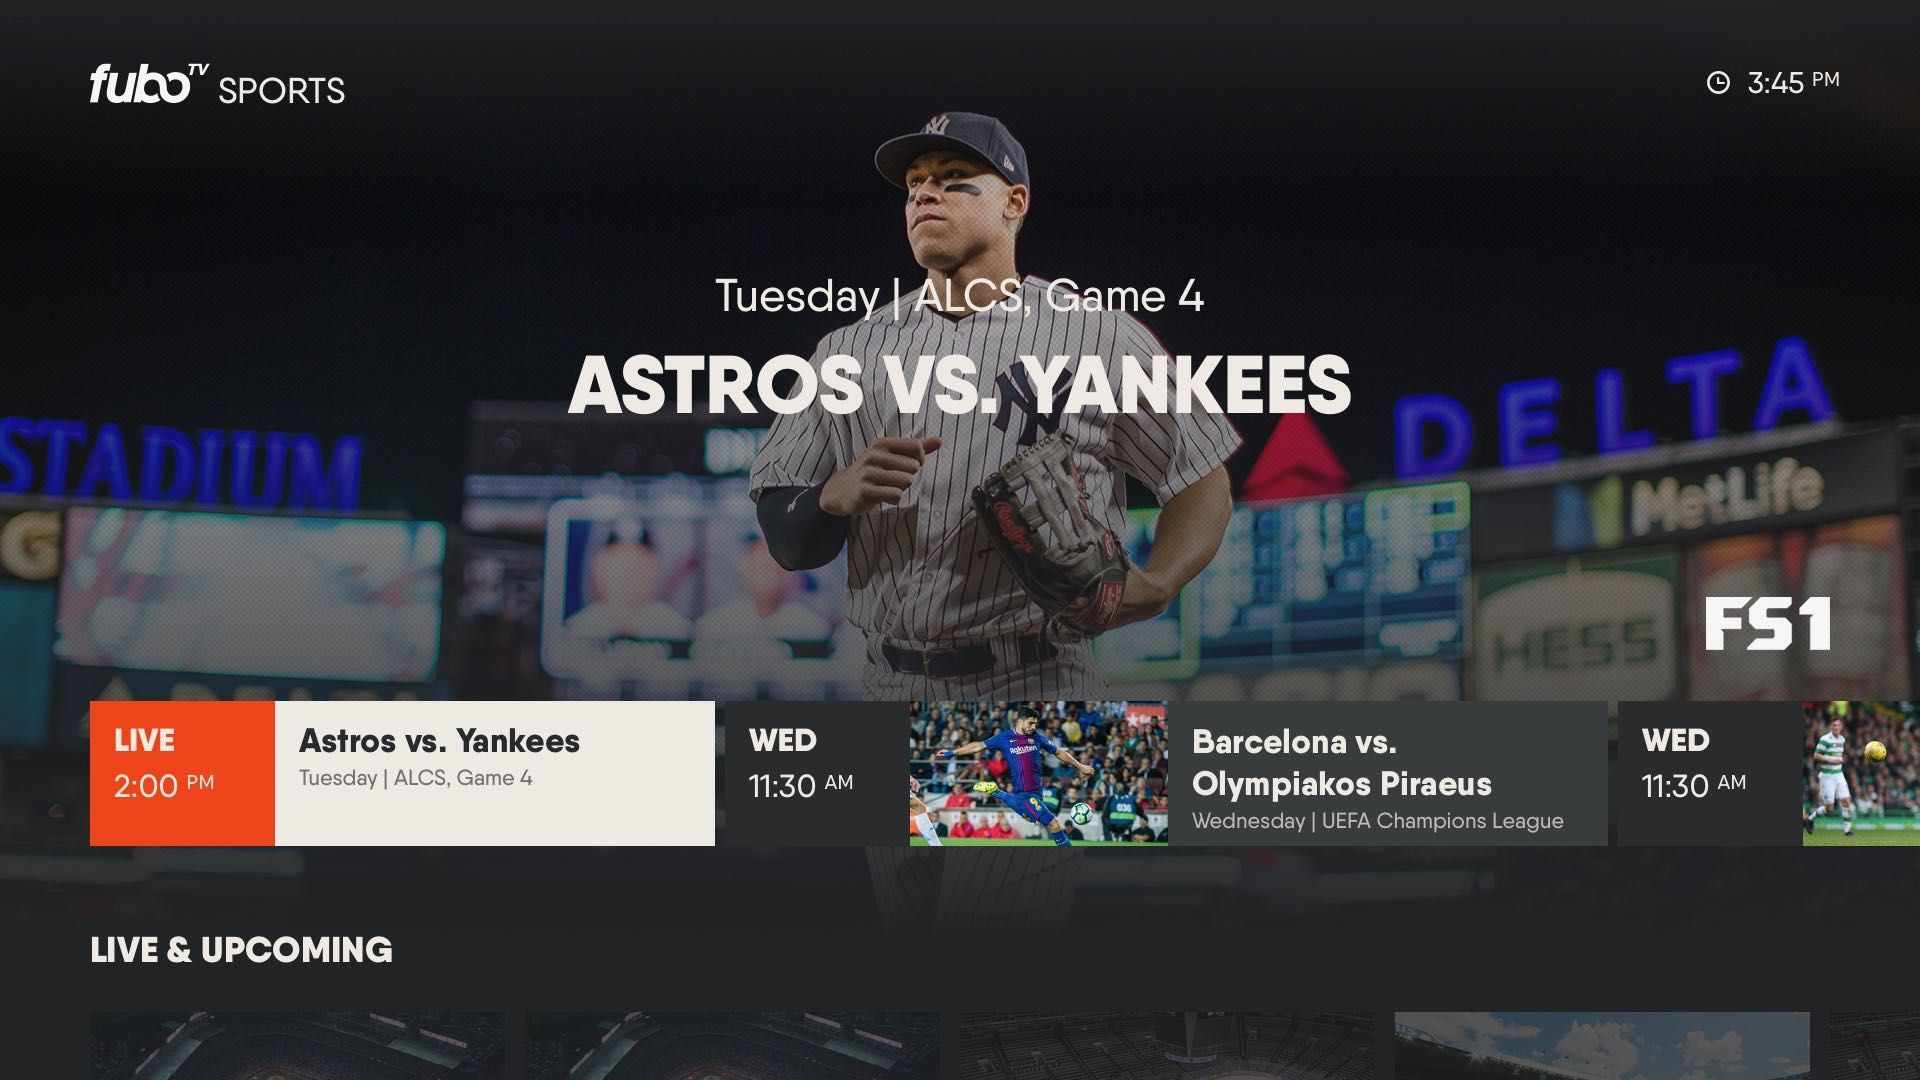 How to Stream 2020 MLB Spring Training Live on Roku Fire